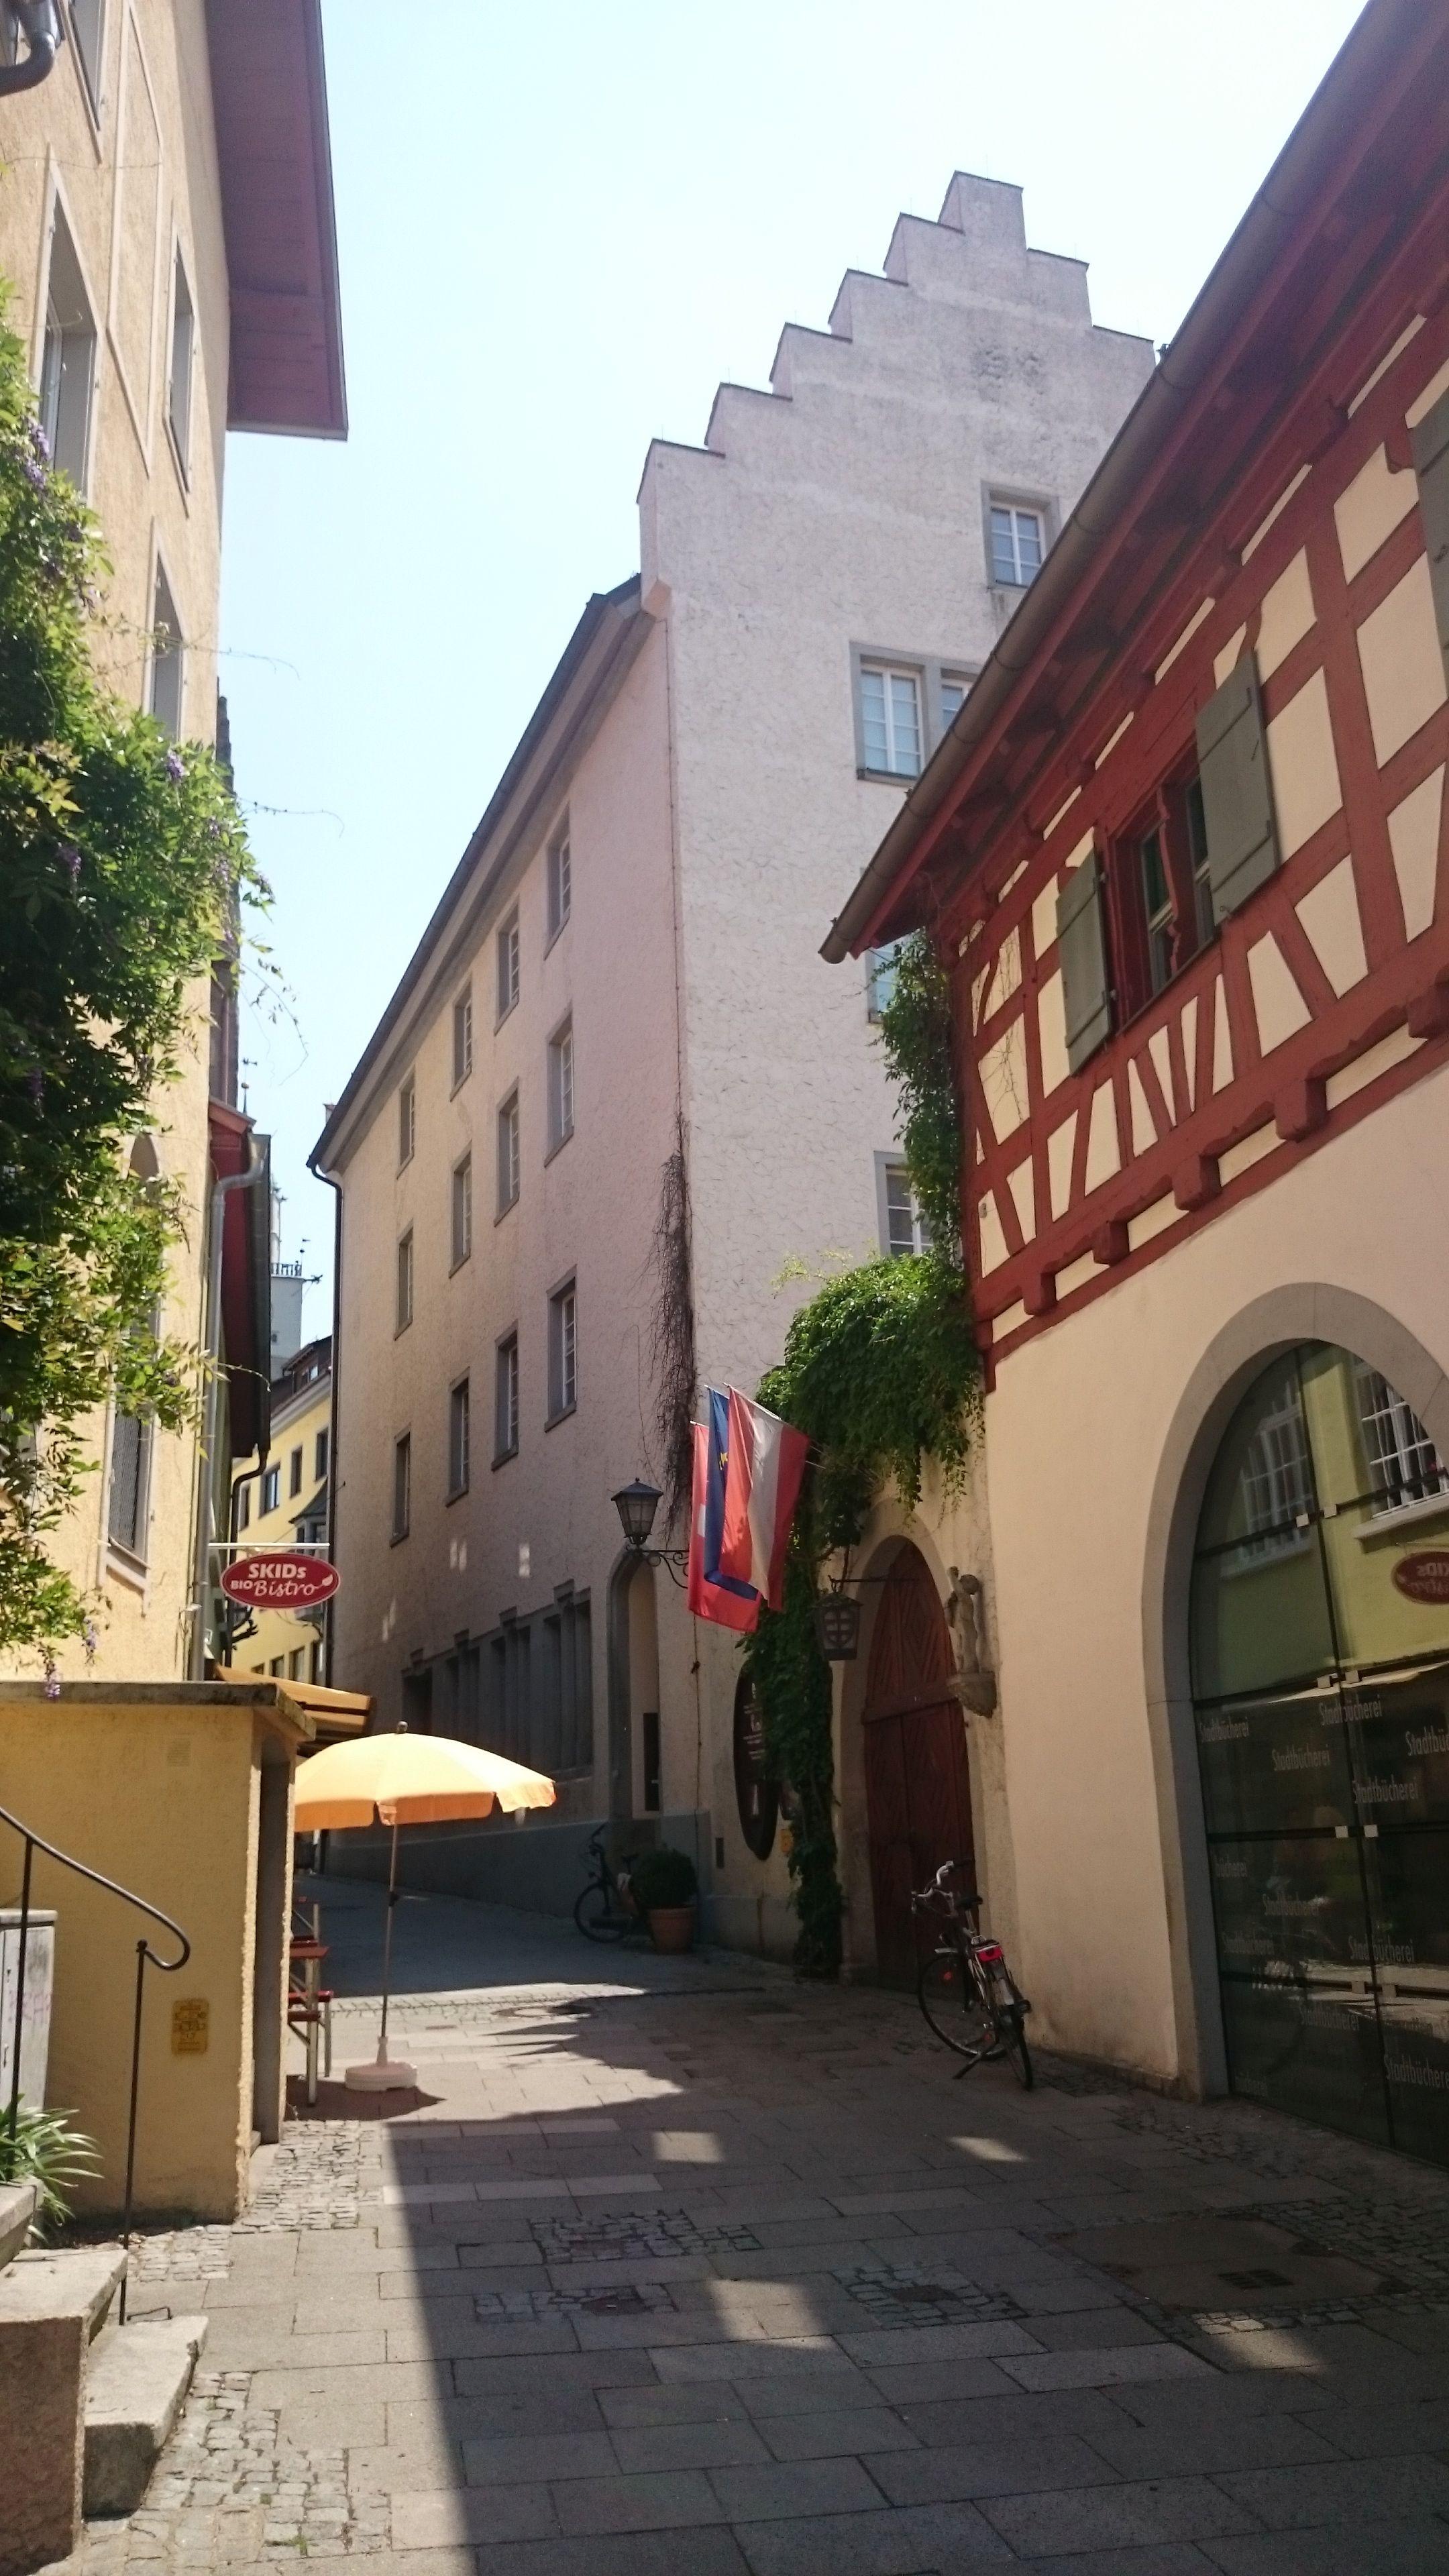 Hittisau single night - Dating den in egg - Judendorf